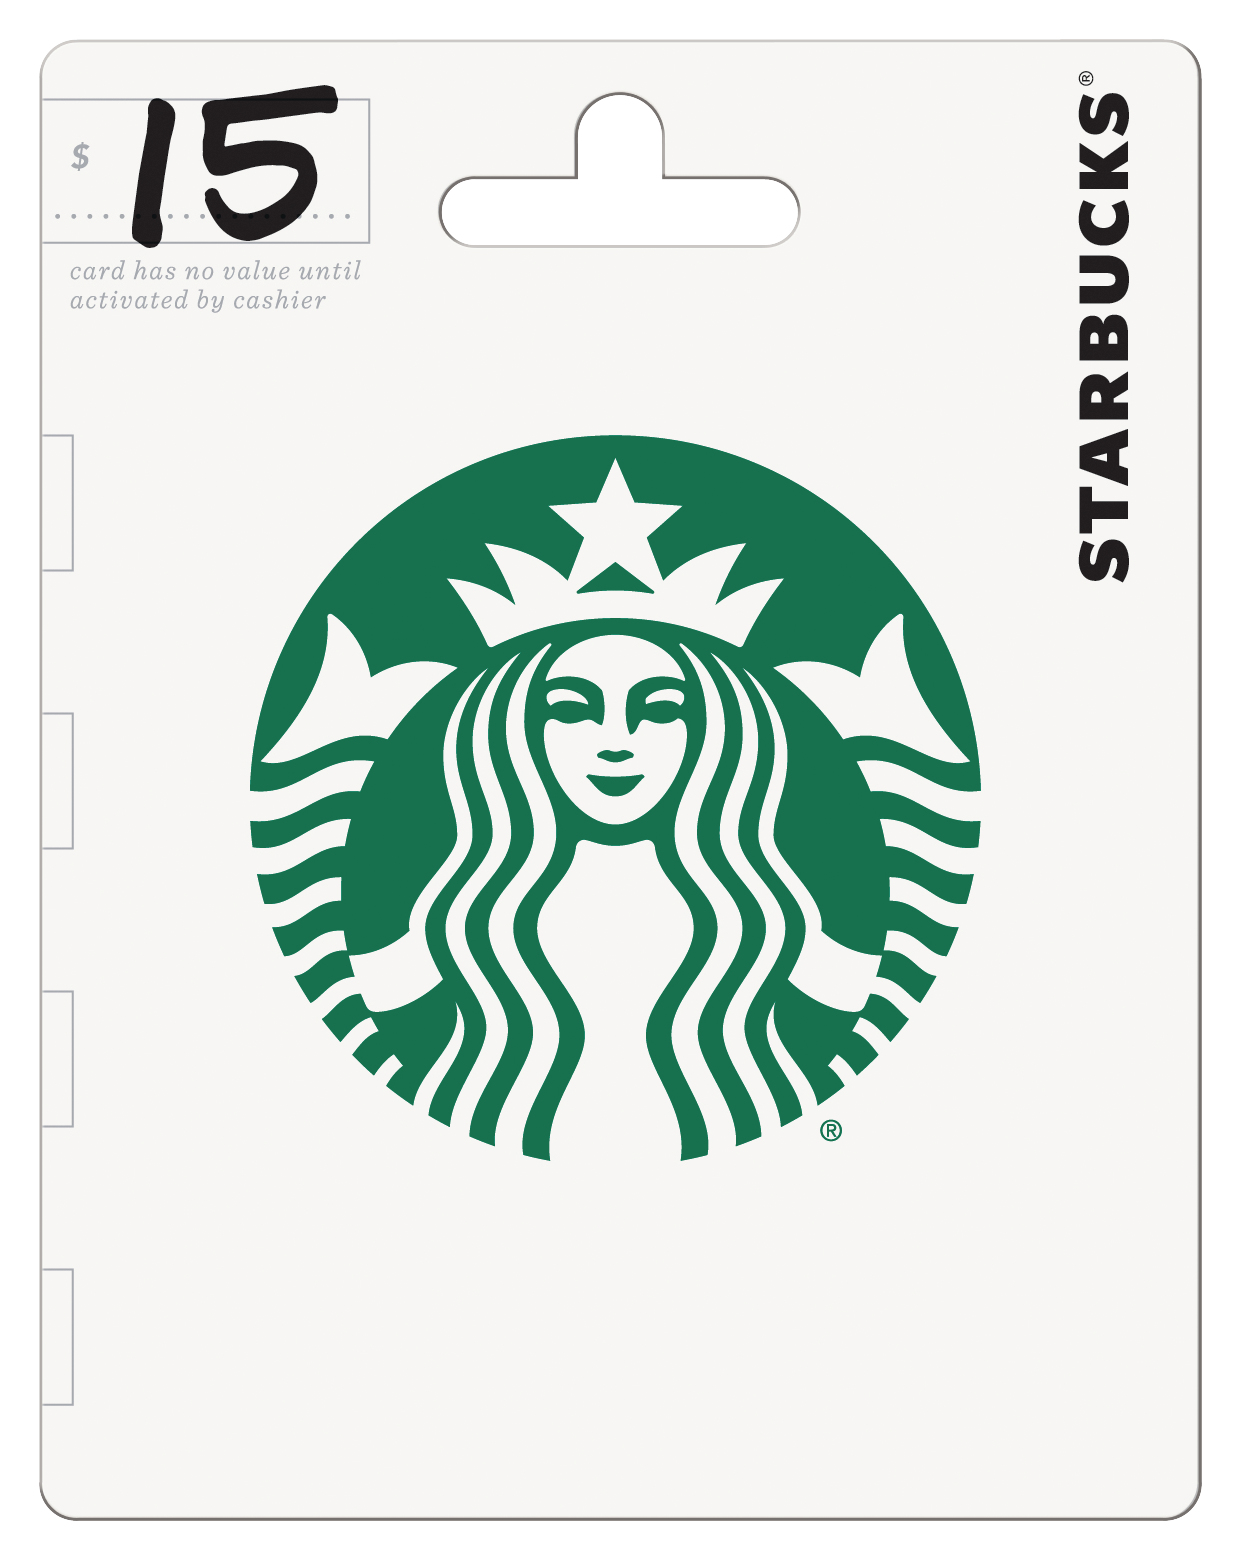 Starbucks $7 Gift Card - Walmart.com